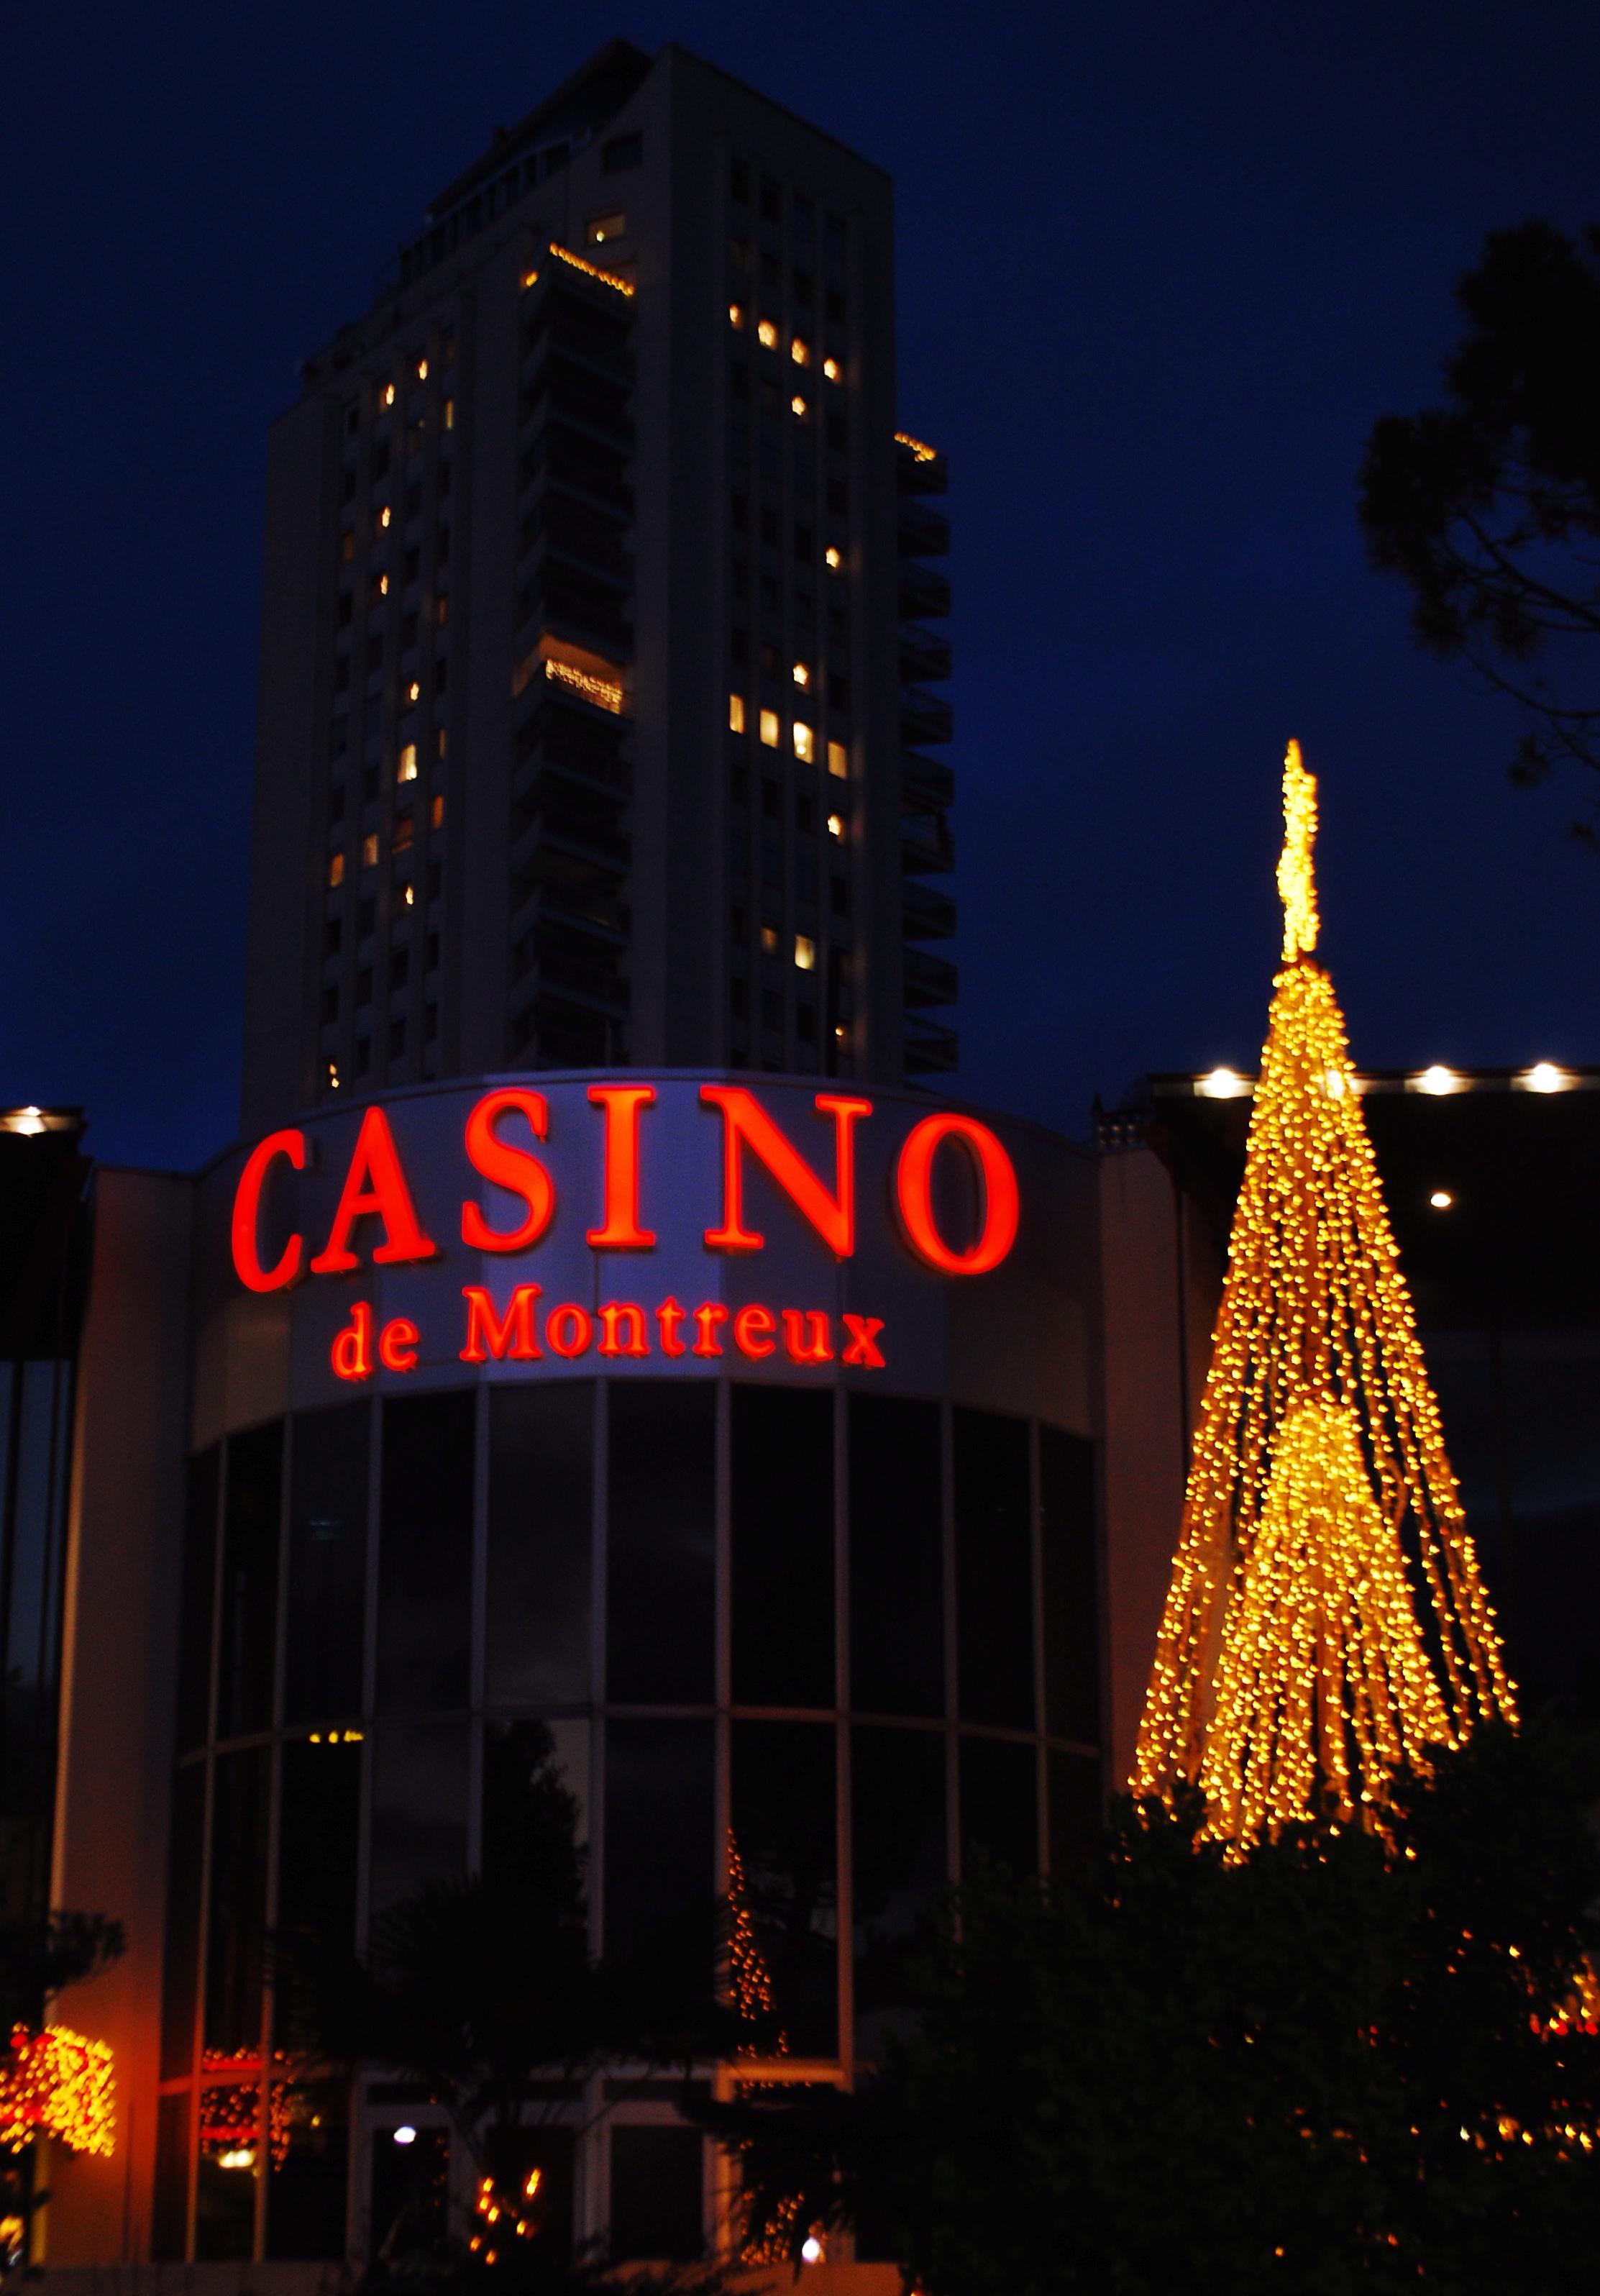 Montreaux casino fire new york state gambling hotline